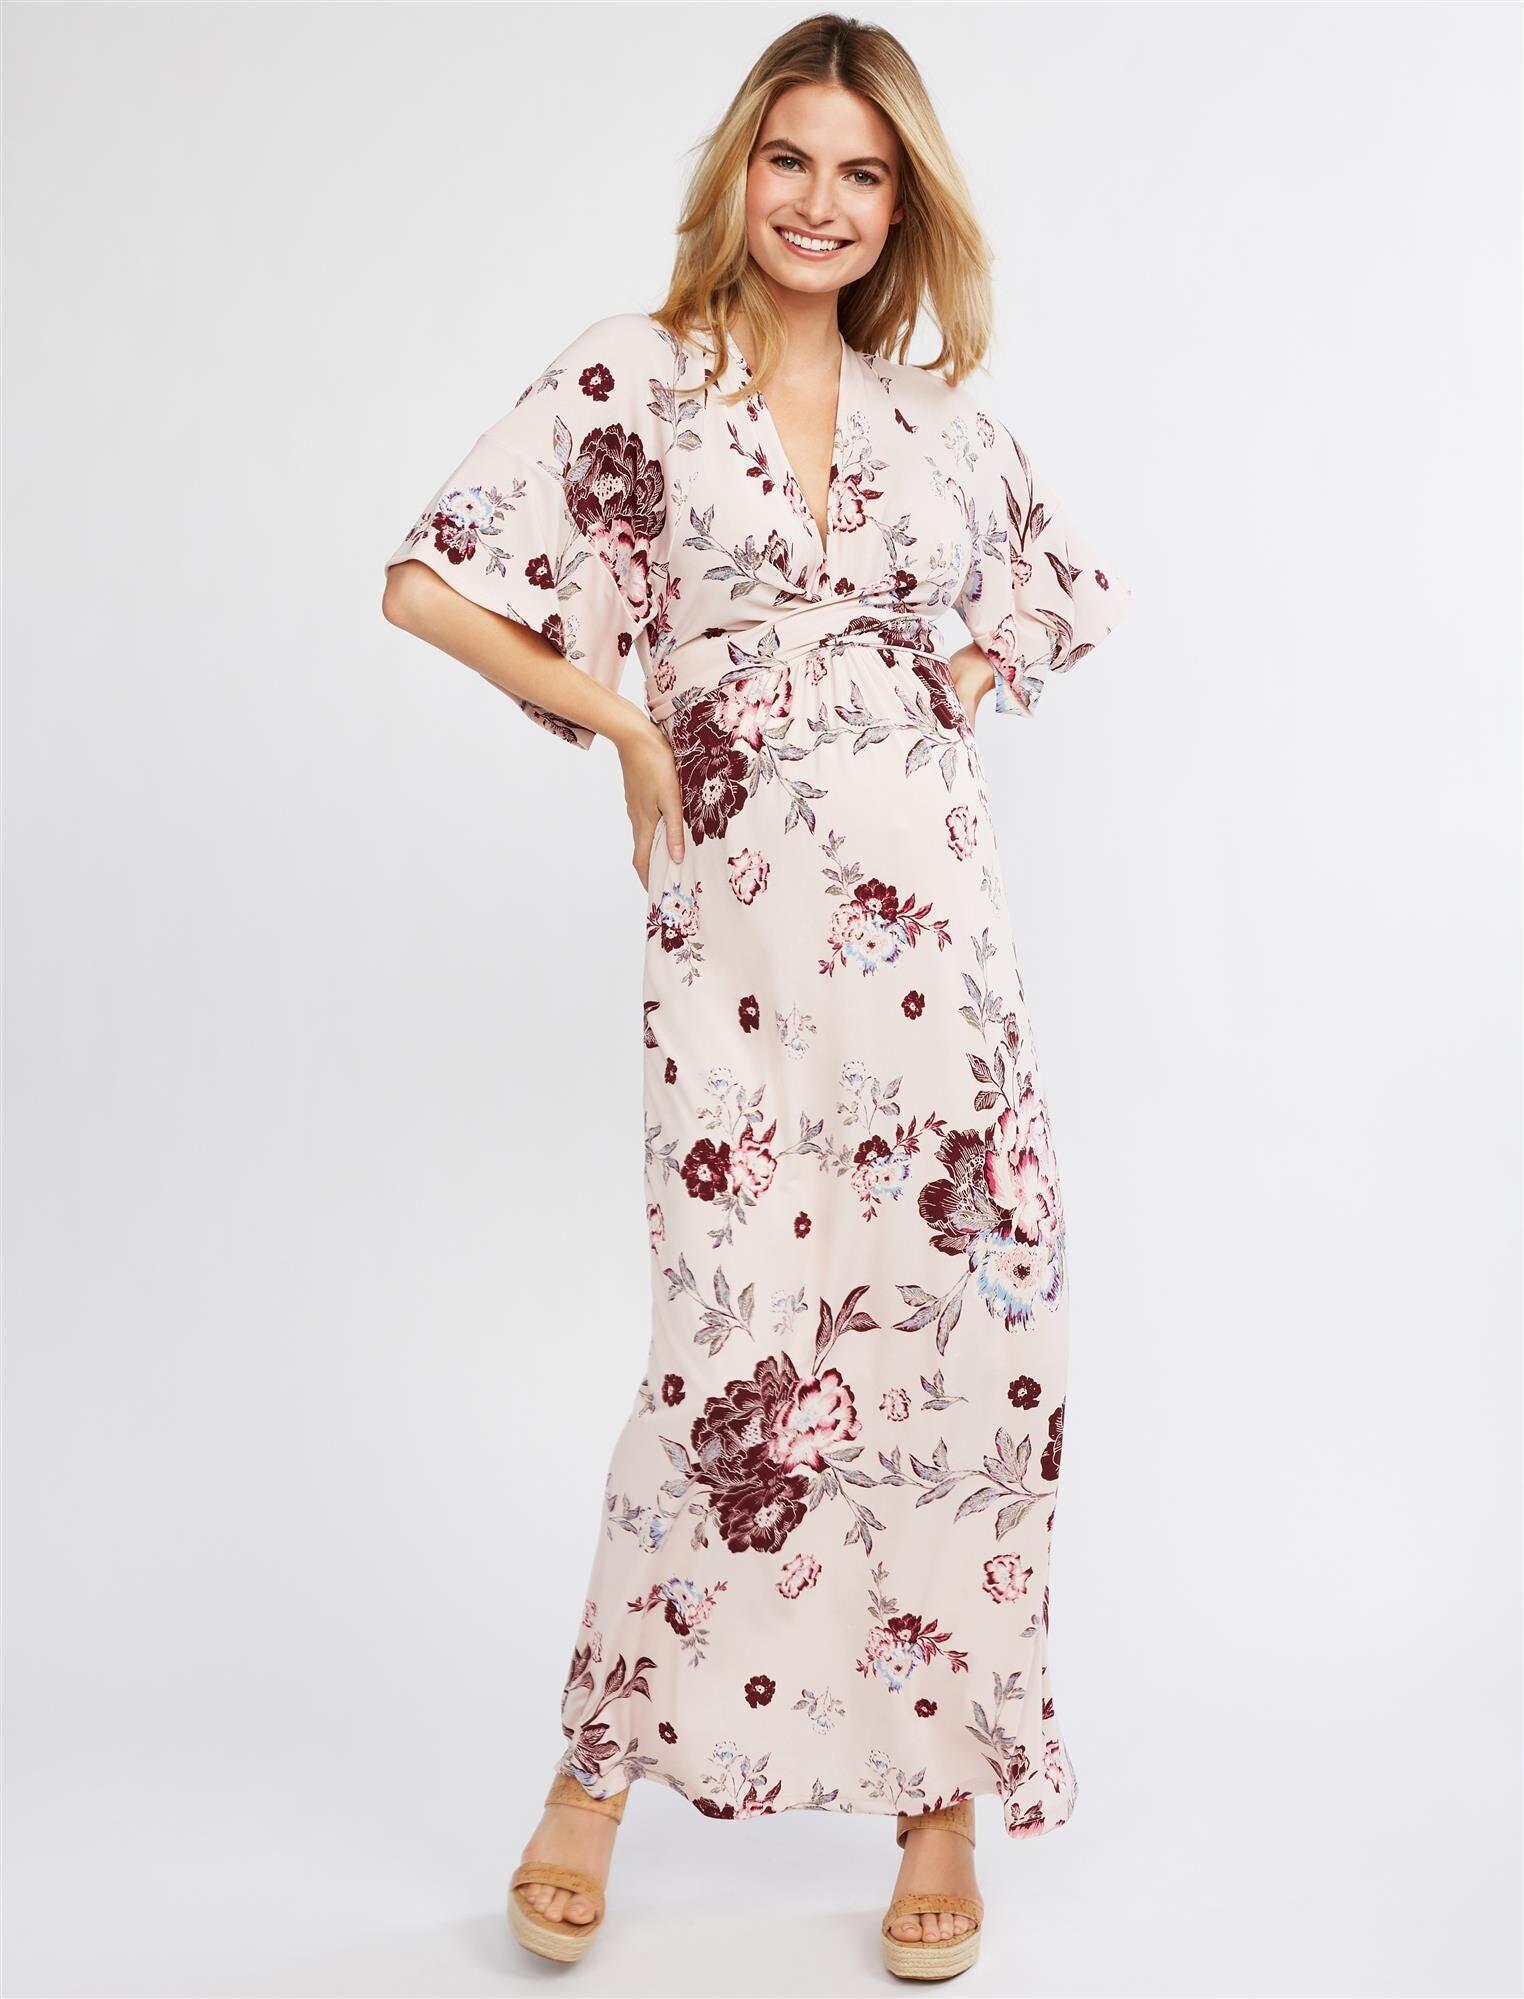 Motherhood Maternity Jessica Simpson Flutter Sleeve Floral Wrap Maternity Dress in   (Size: )